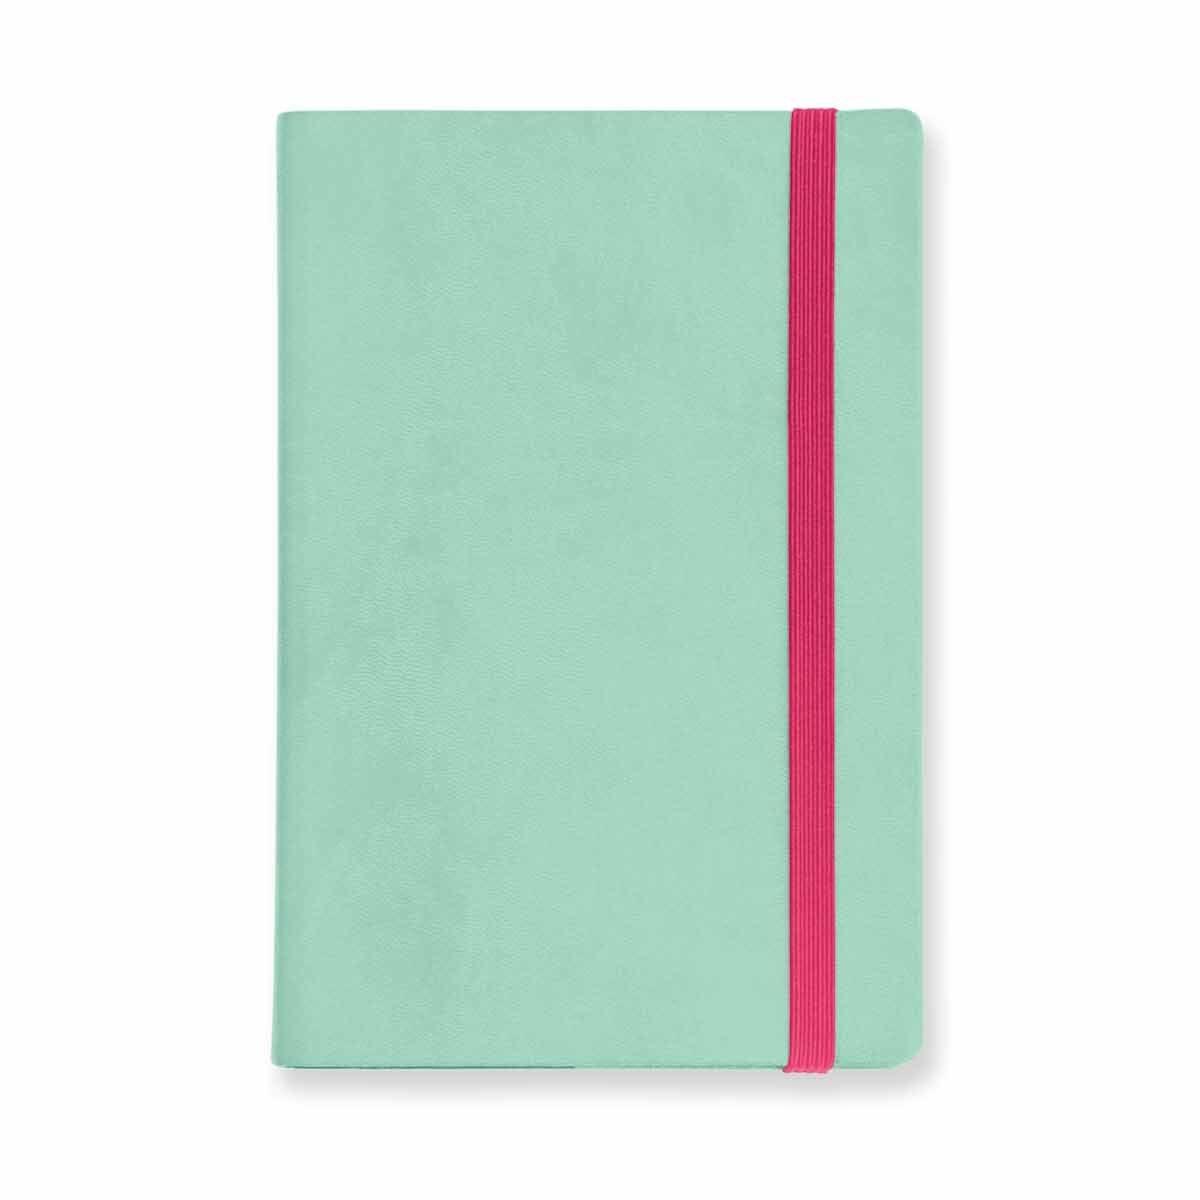 Legami My Notebook Large Lined Aqua